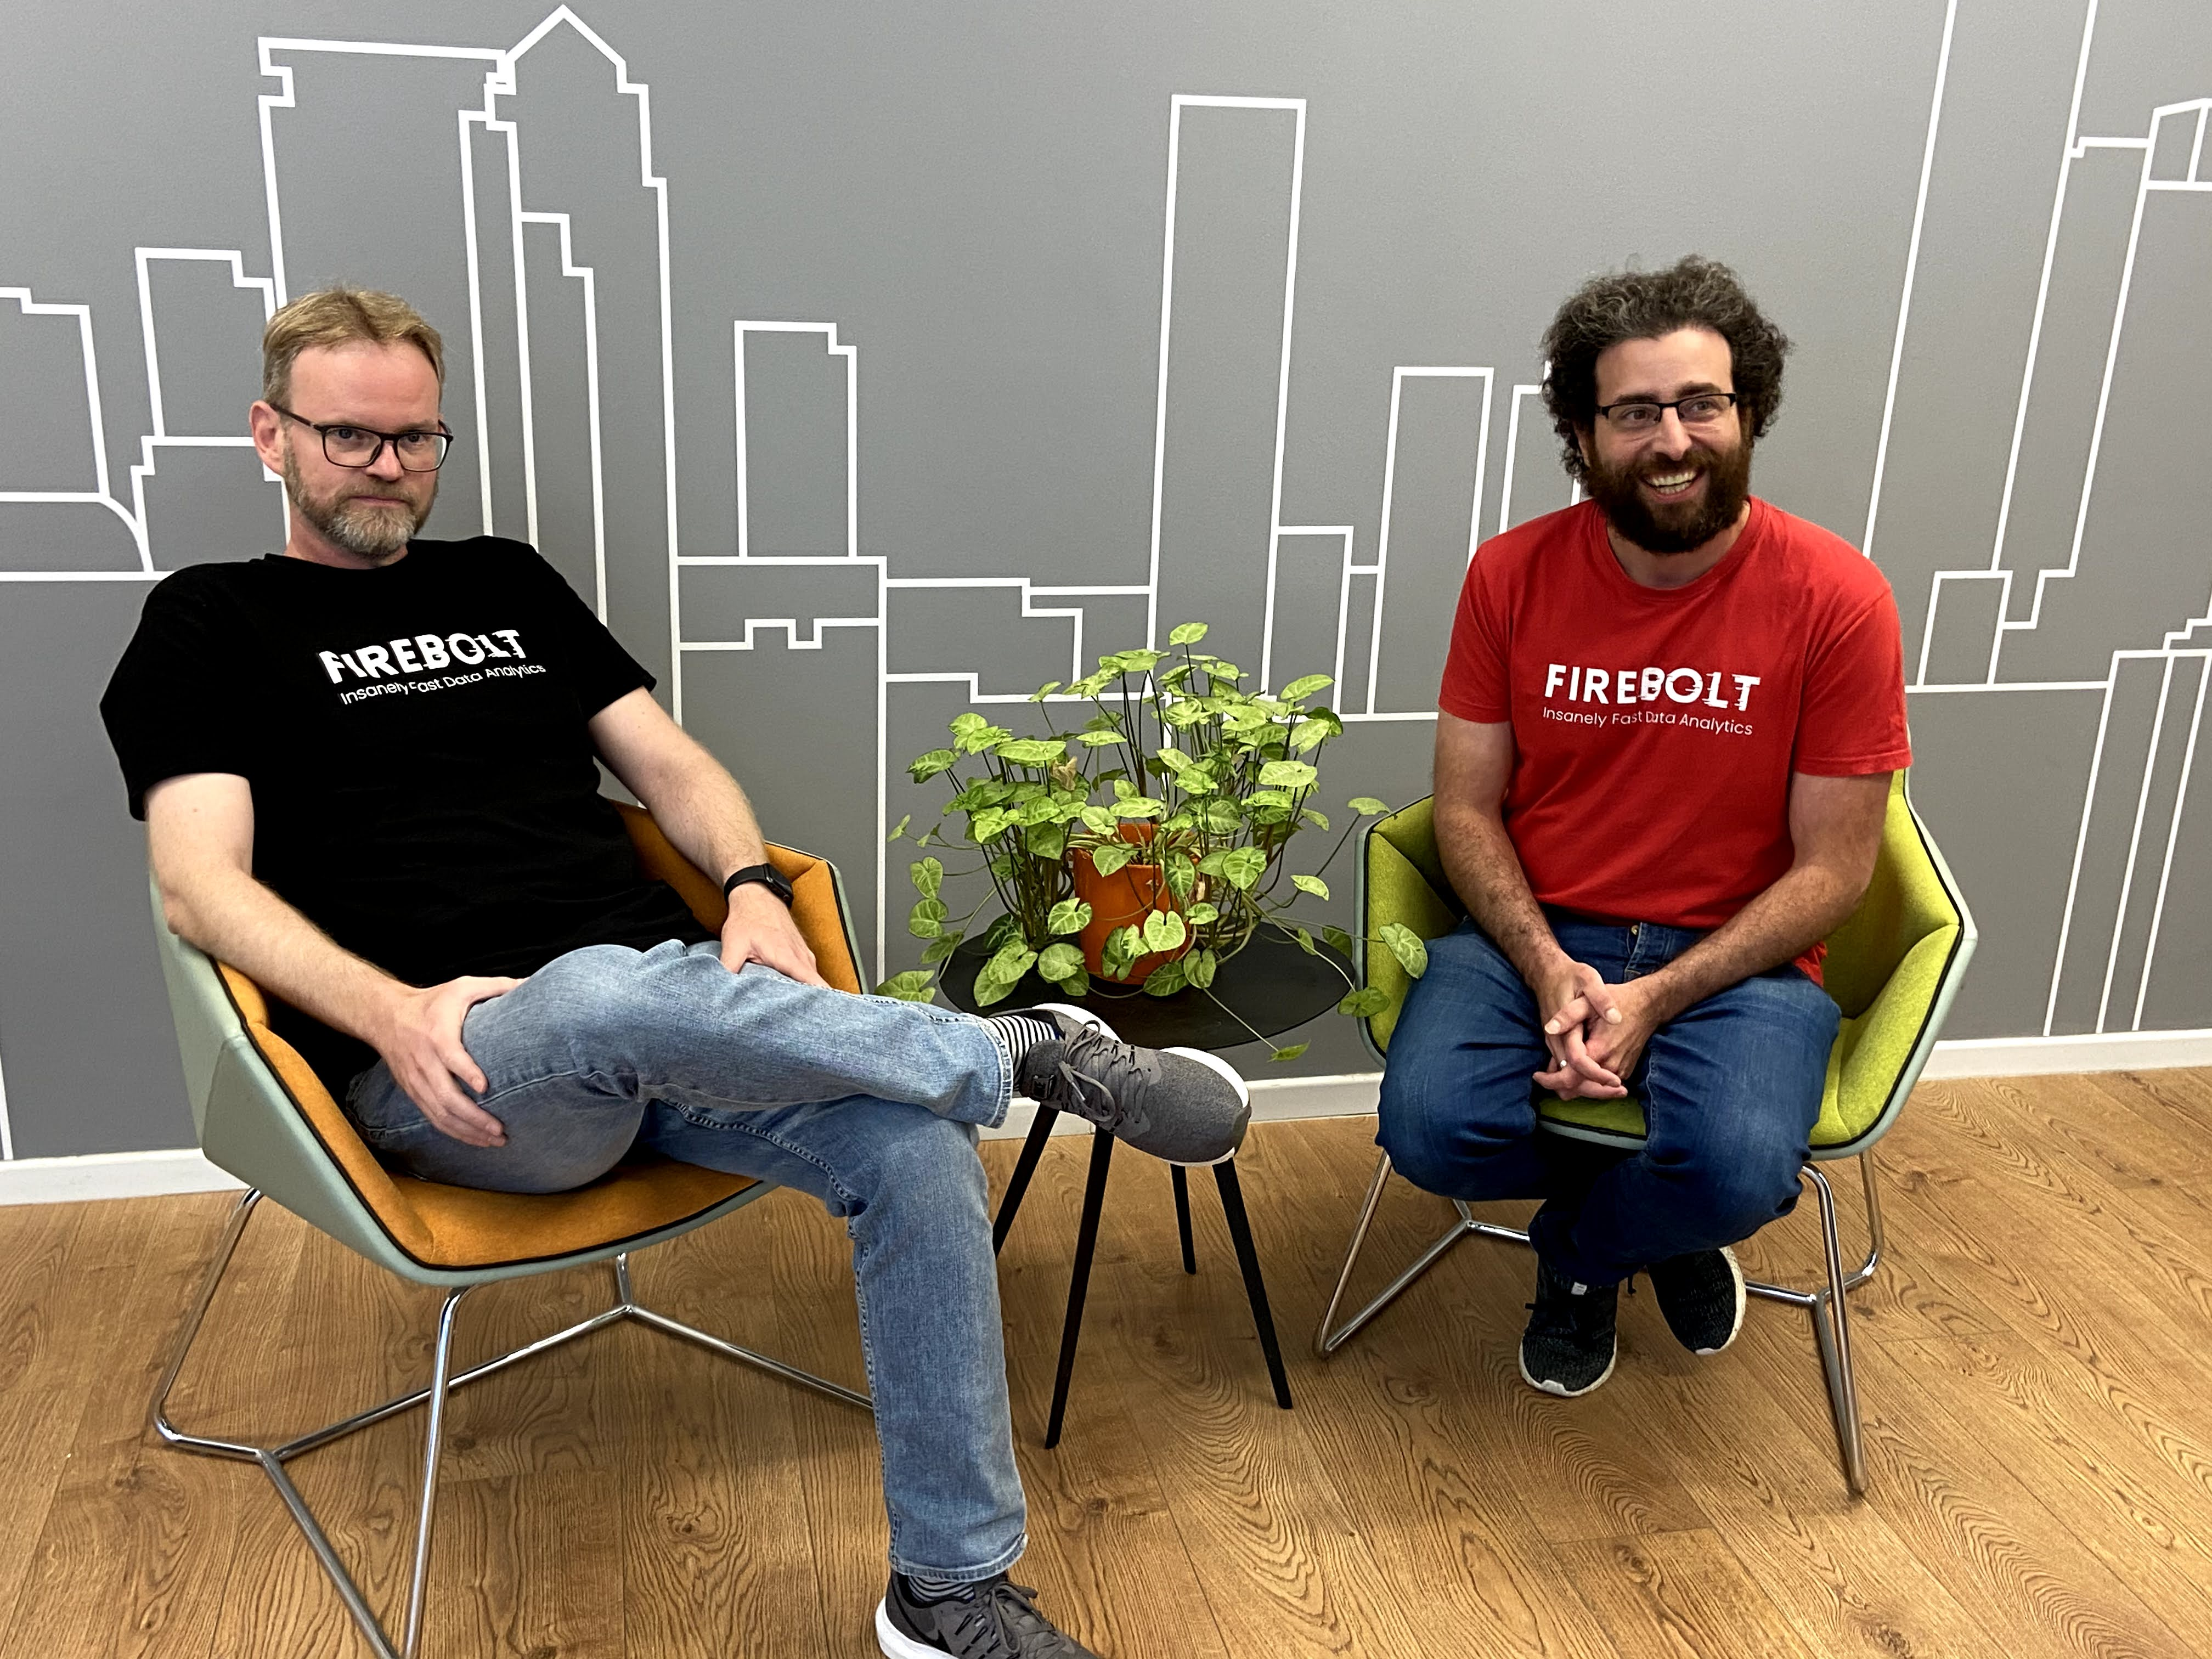 Firebolt co-founders Eldad Farkash (right) and Saar Bitner. Photo: Firebolt